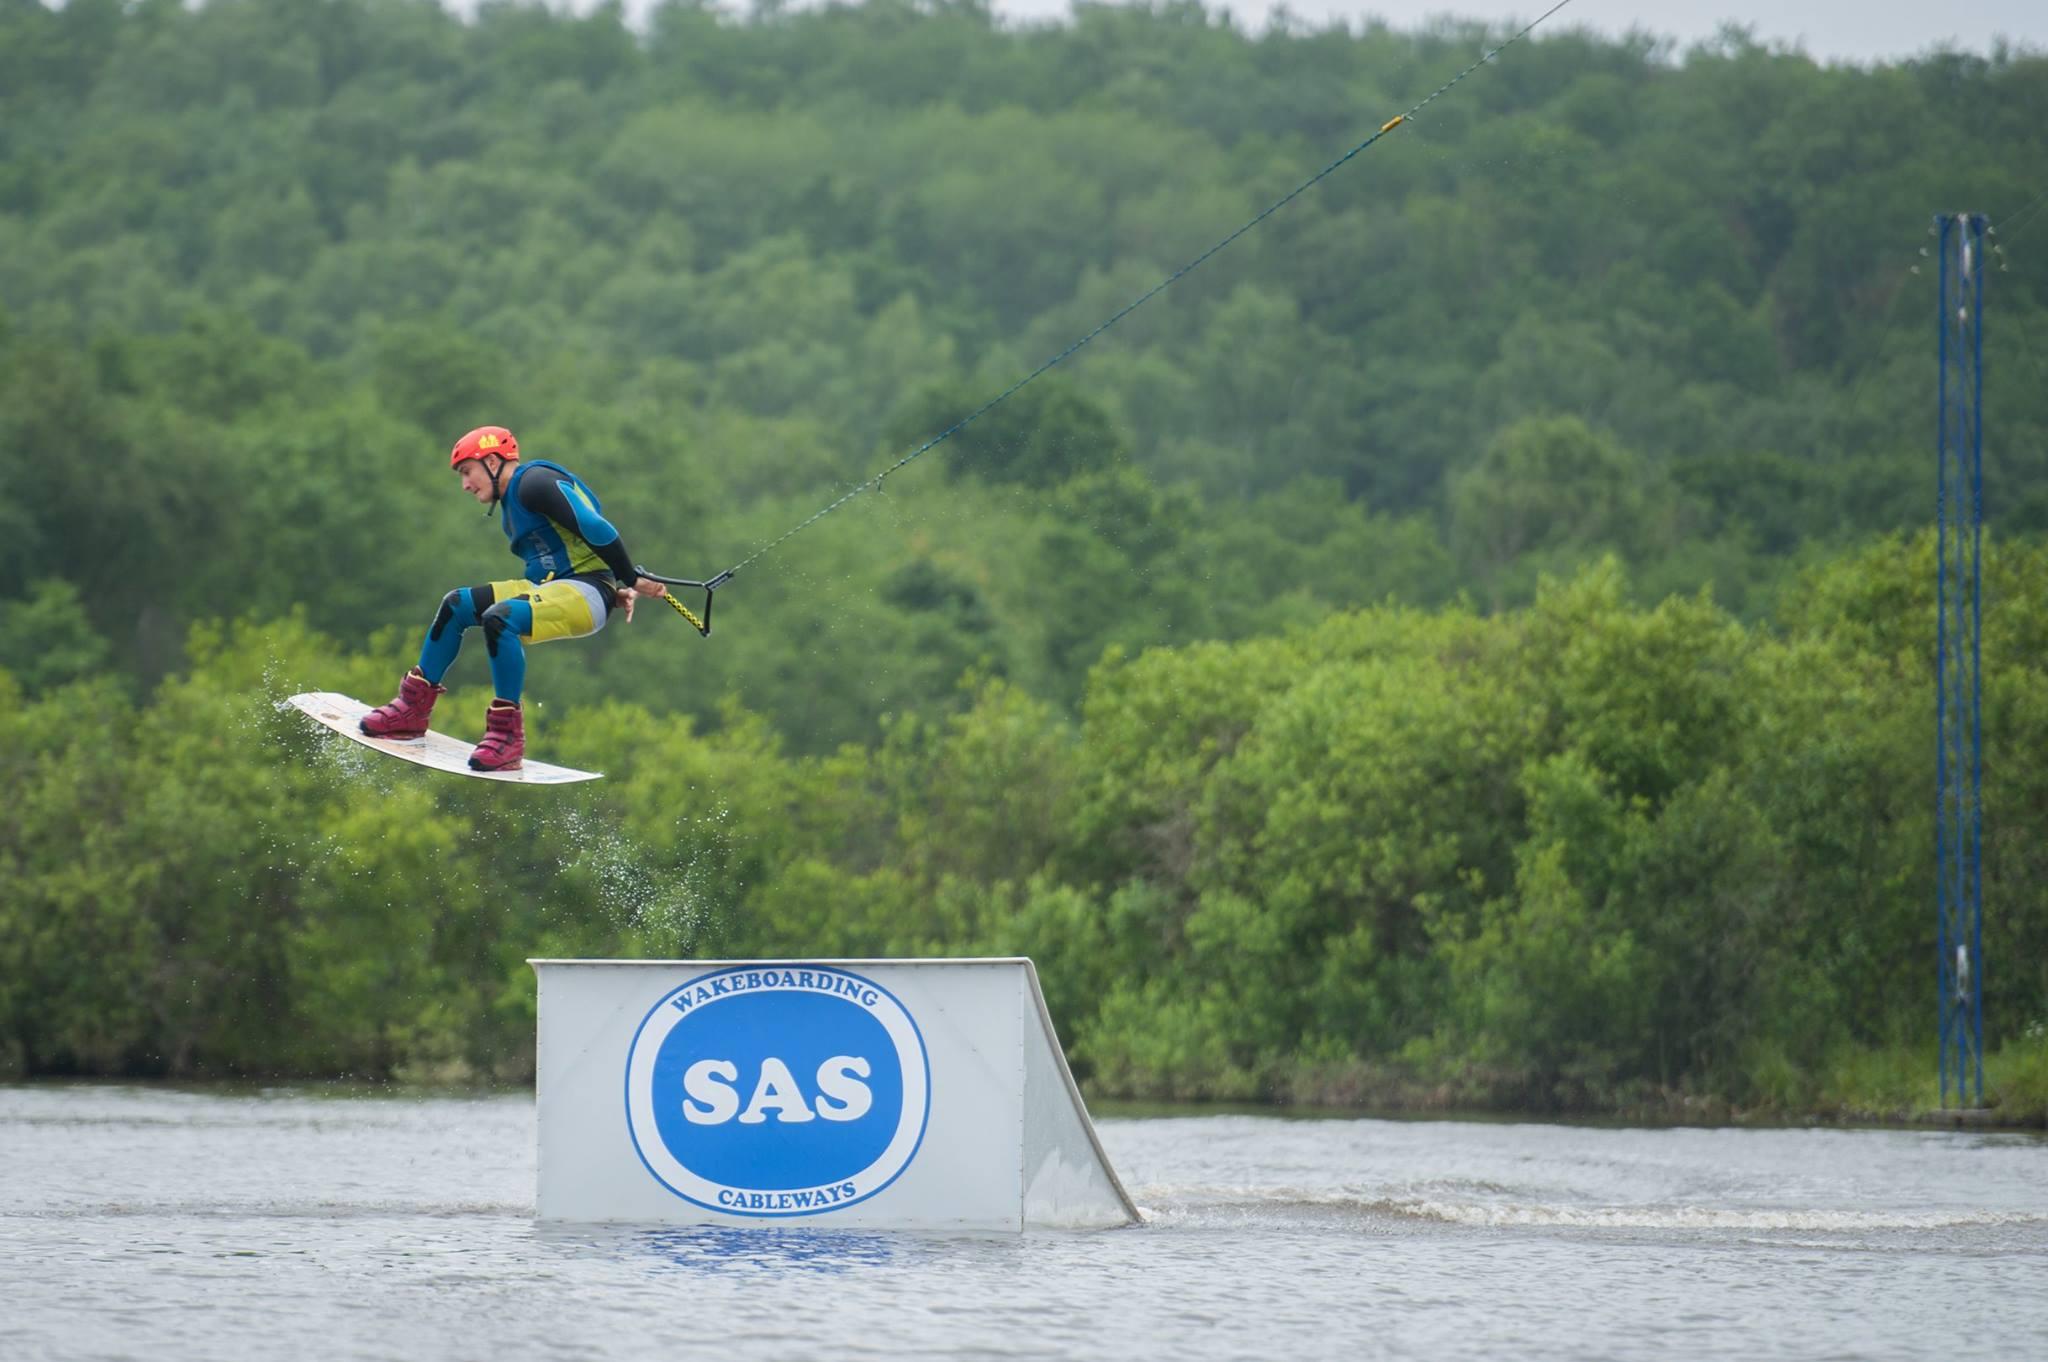 Vakeboarding Vereskino